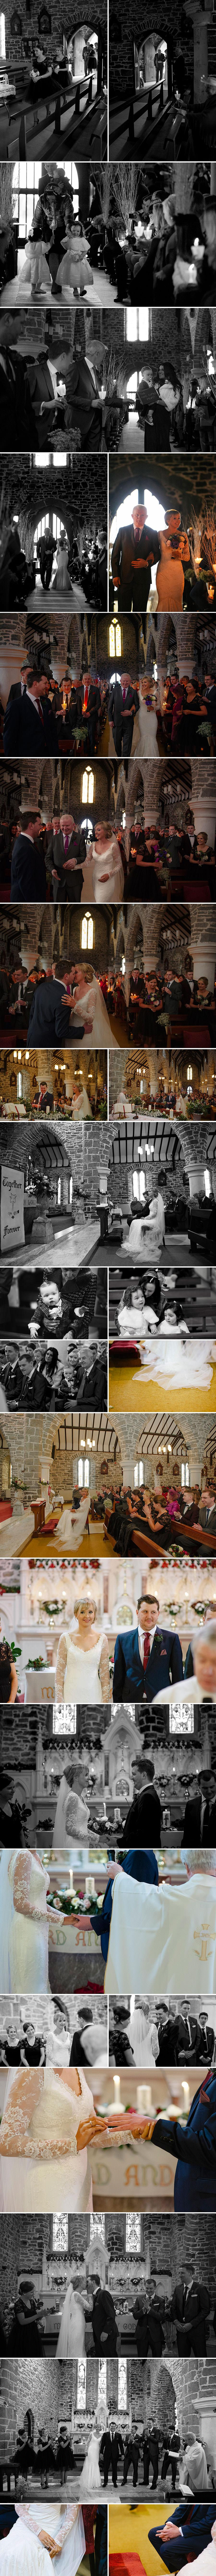 Ballyseede Castle Wedding (2)